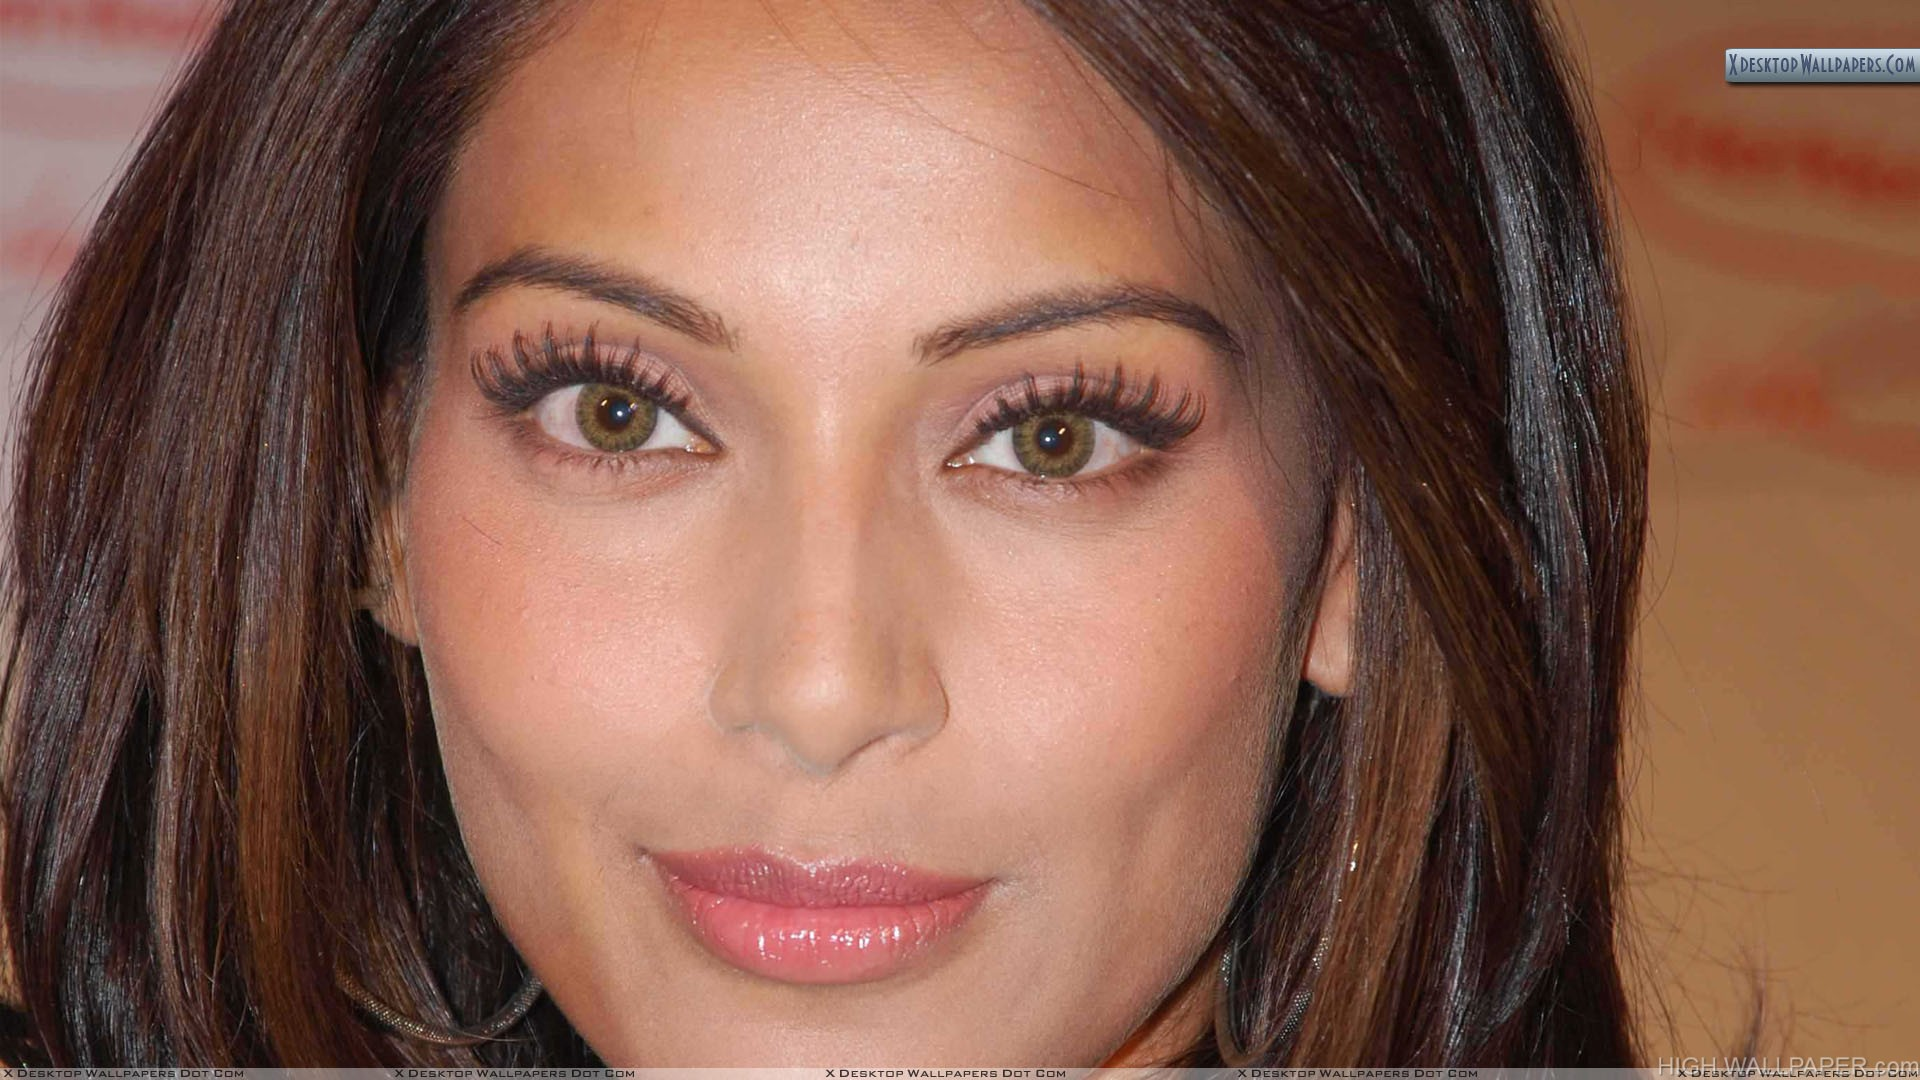 Bipasha Basu Pink Lips And Brown Eyes Face Closeup